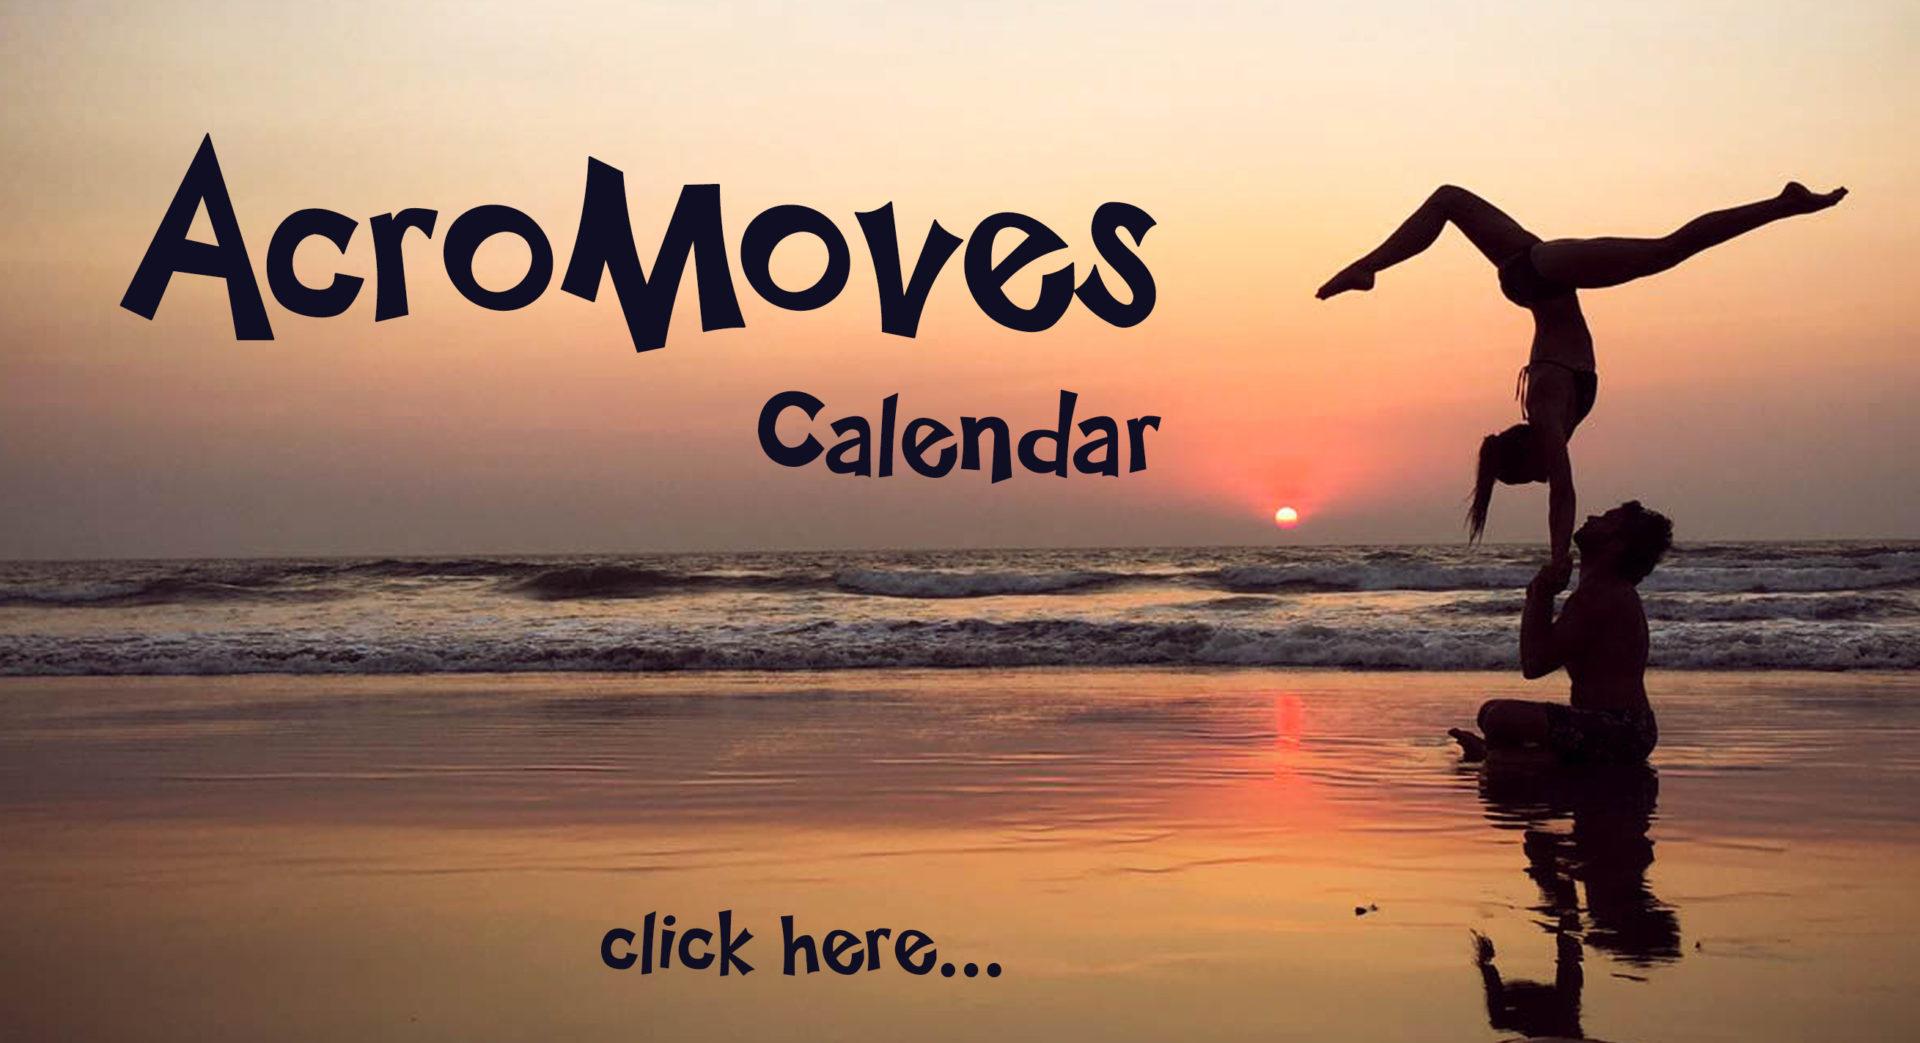 calendar-click-here